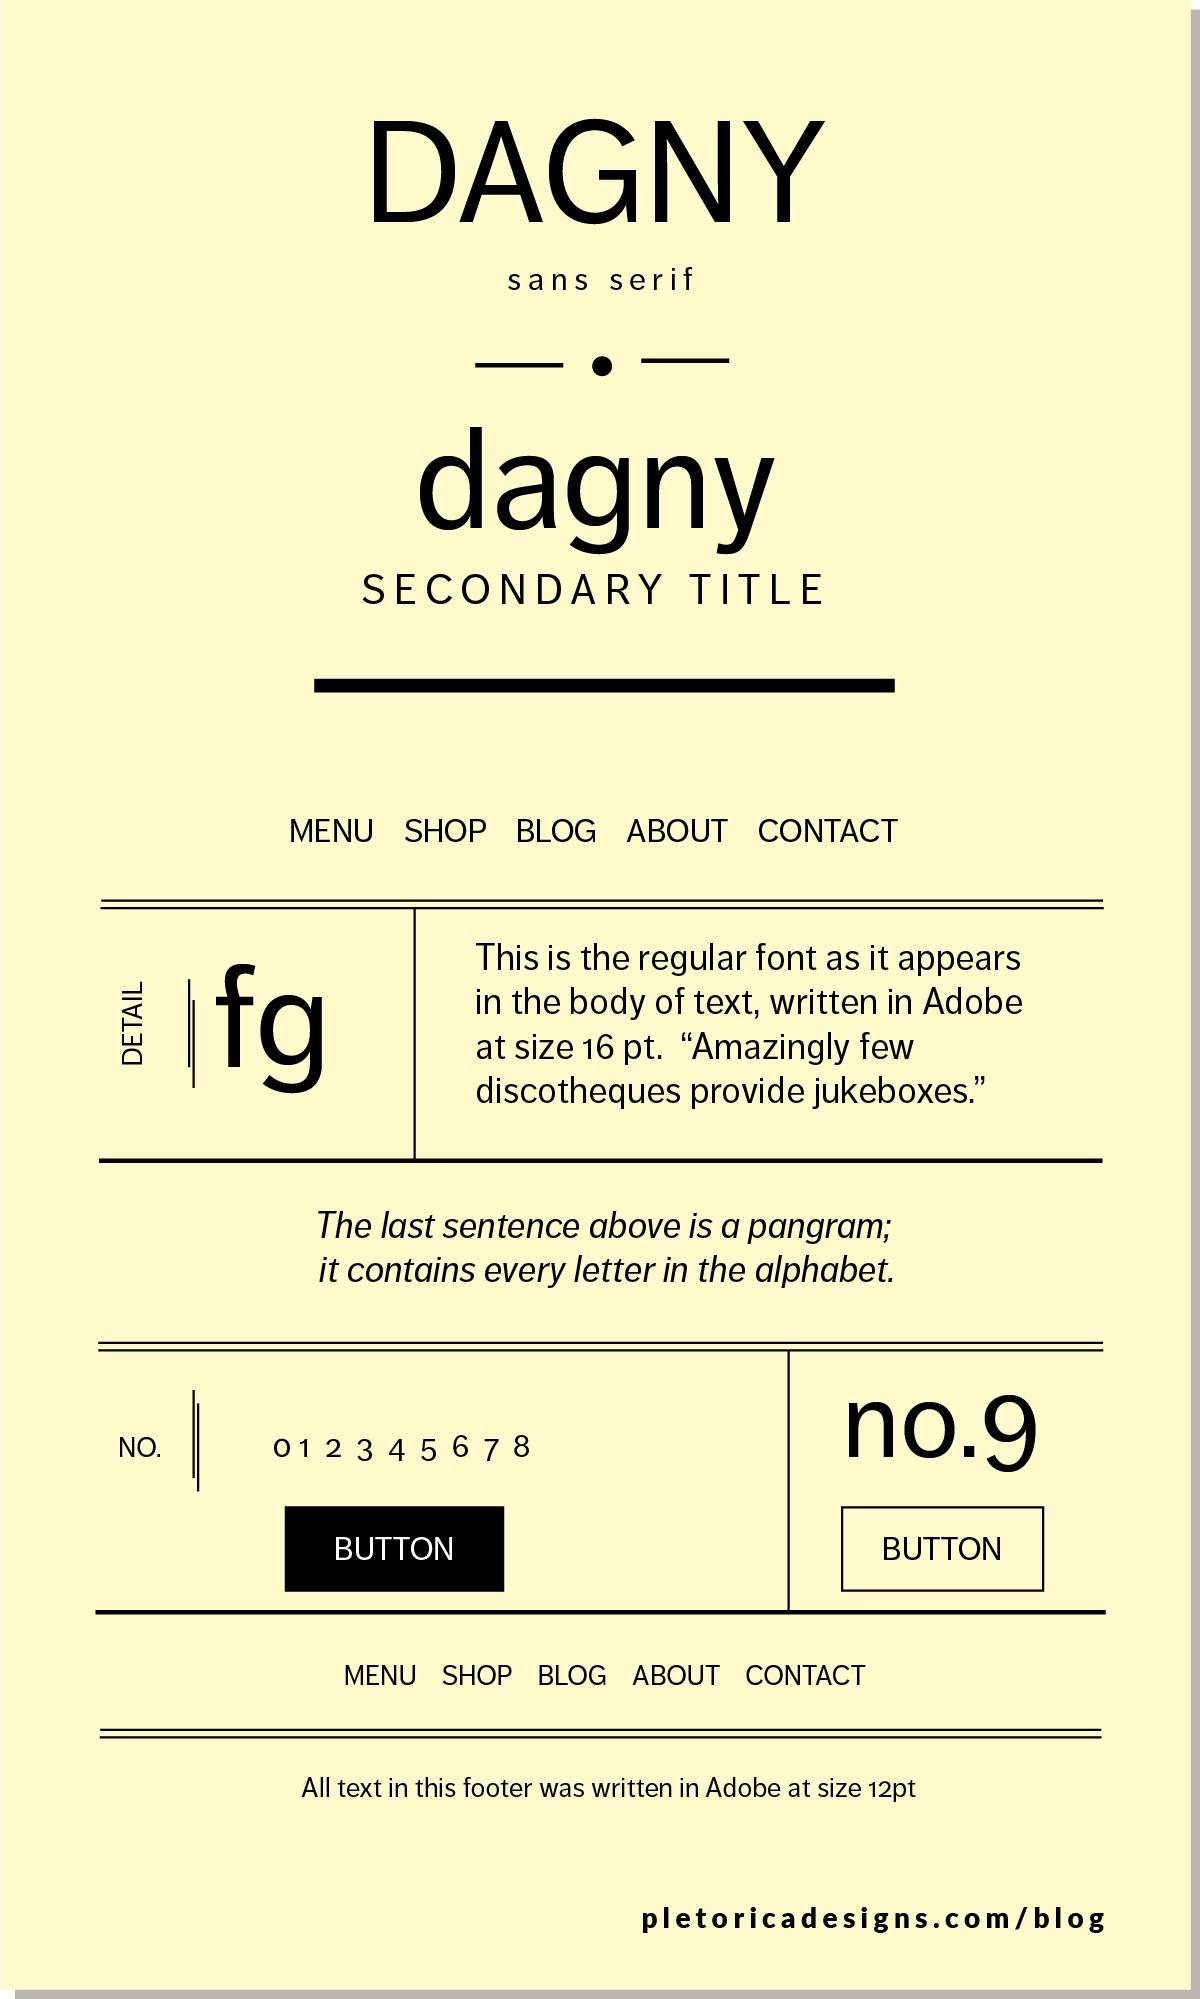 LET'S TYPE: Dagny — PLETÓRICA DESIGNS